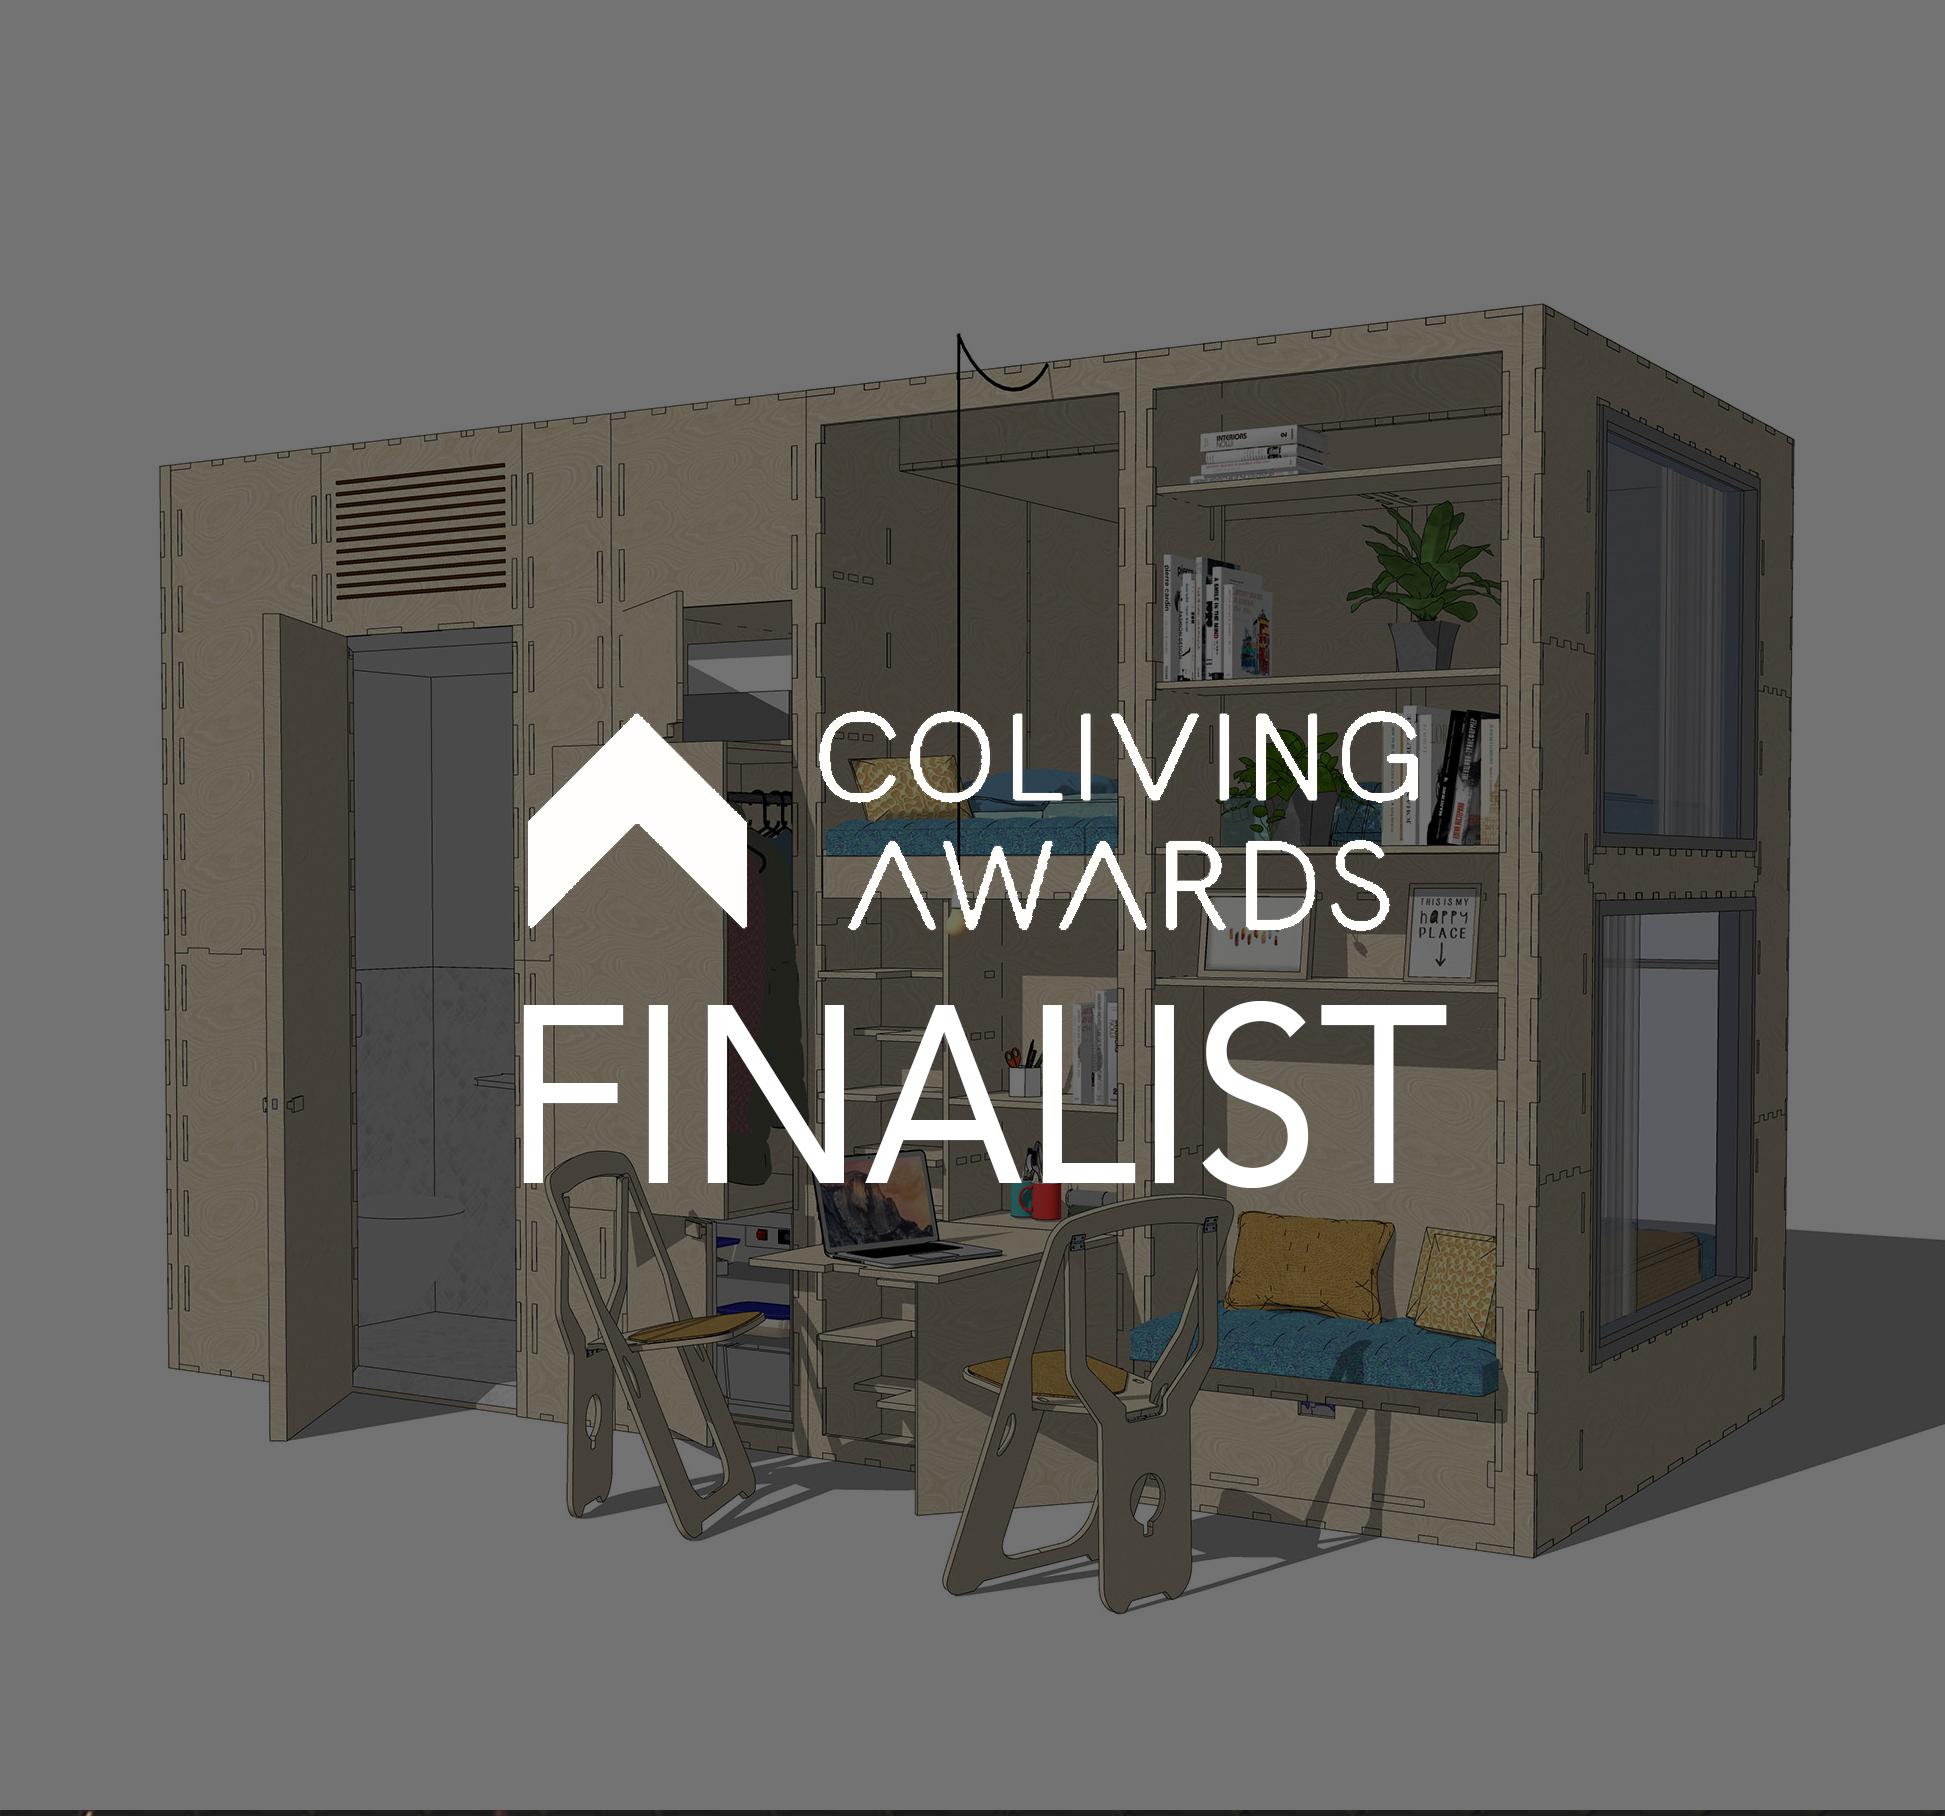 Nyasha Harper-Michon - KumbaPod Coliving Awards Finalist 2021